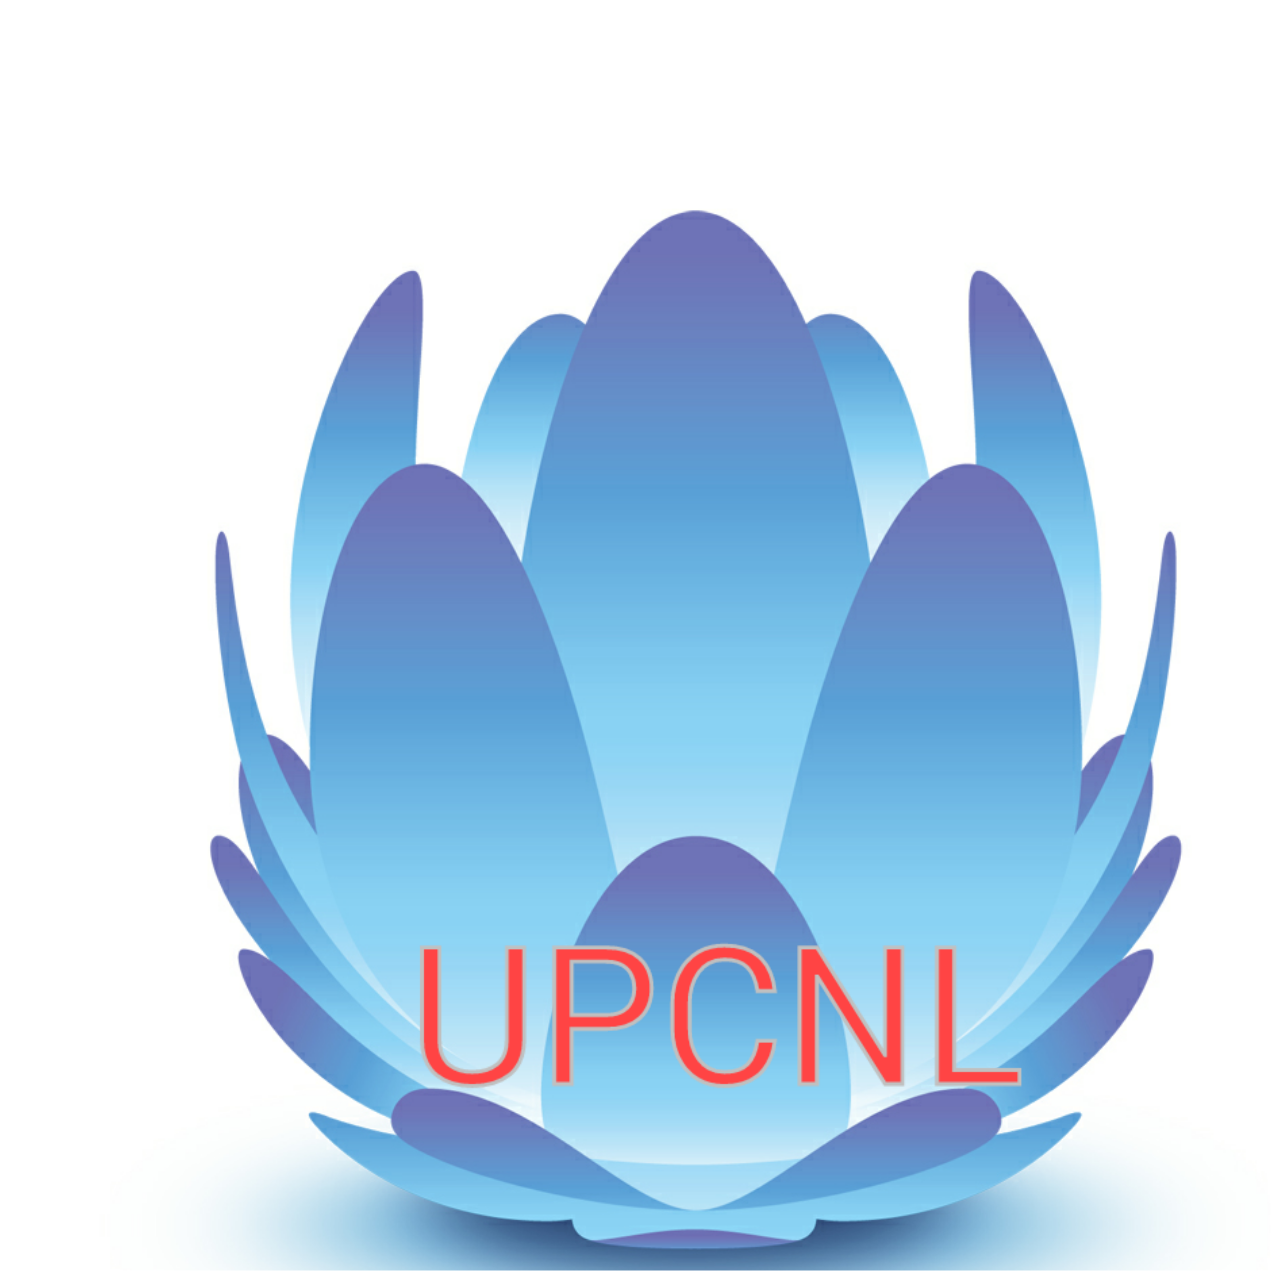 UPCNL